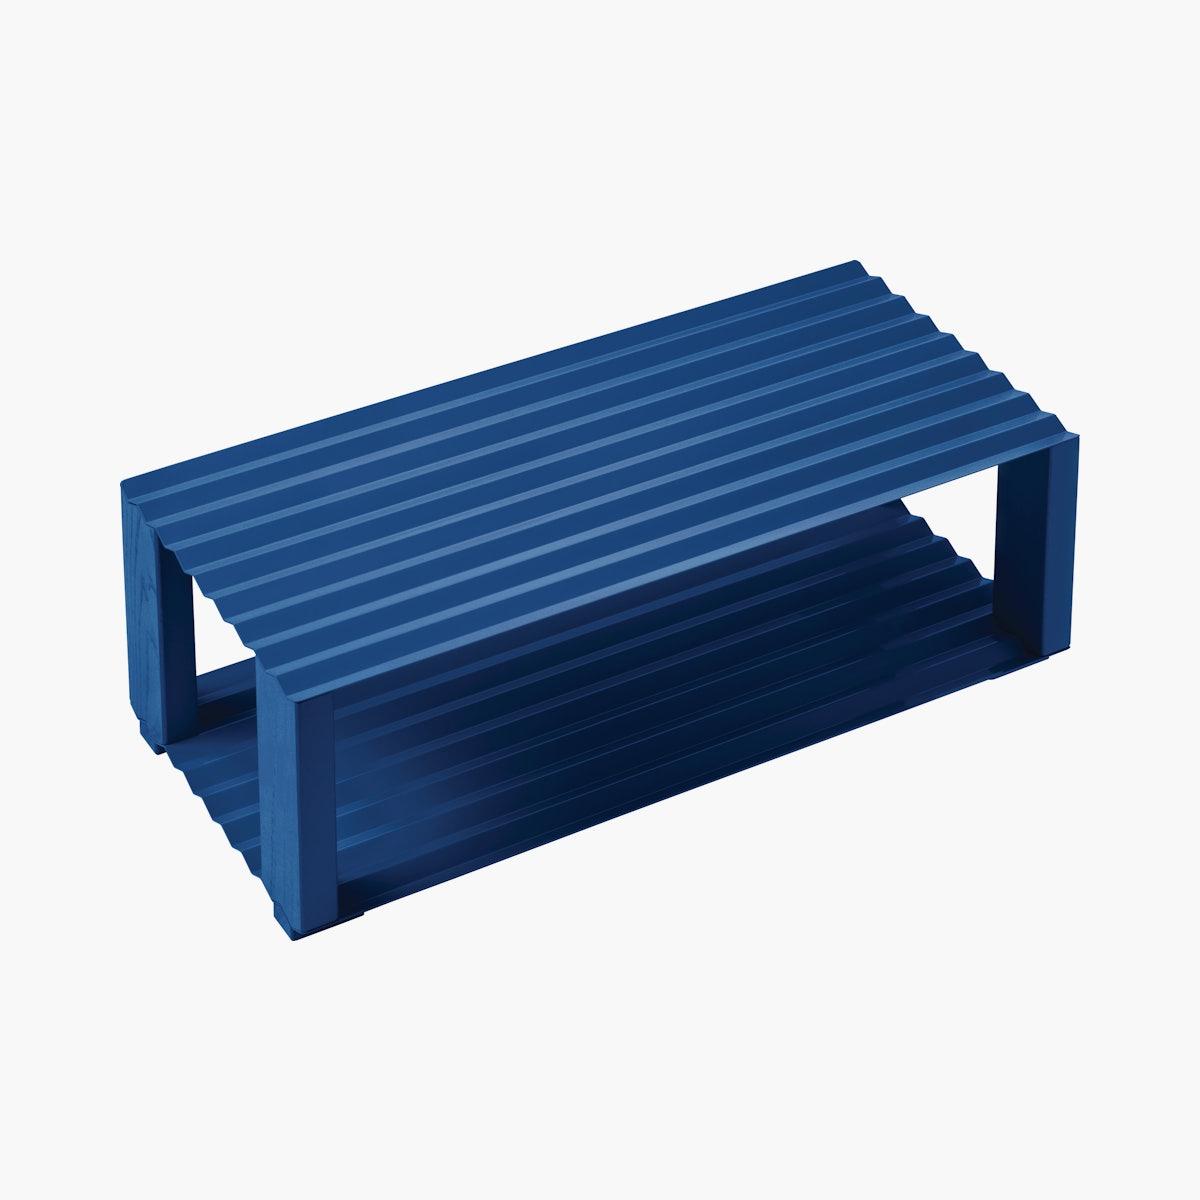 Corrugate Shoe Tray